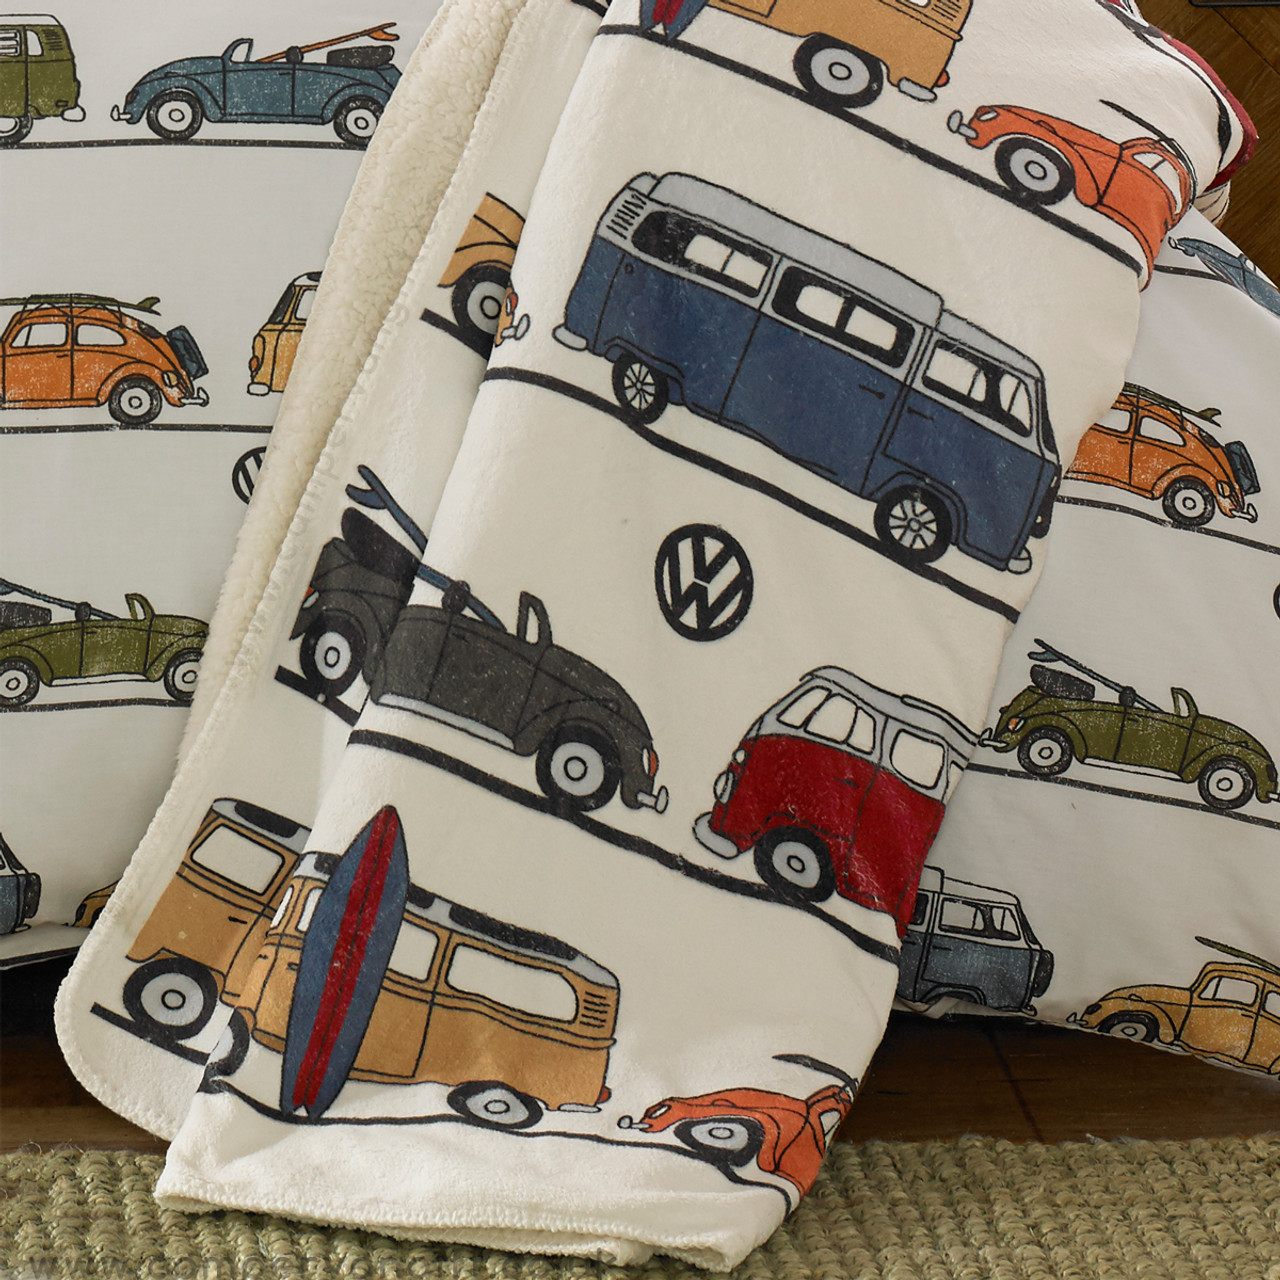 fun camper VW throw blanket  00496.1519827865.jpg c 2 imbypass on 91e88b81e